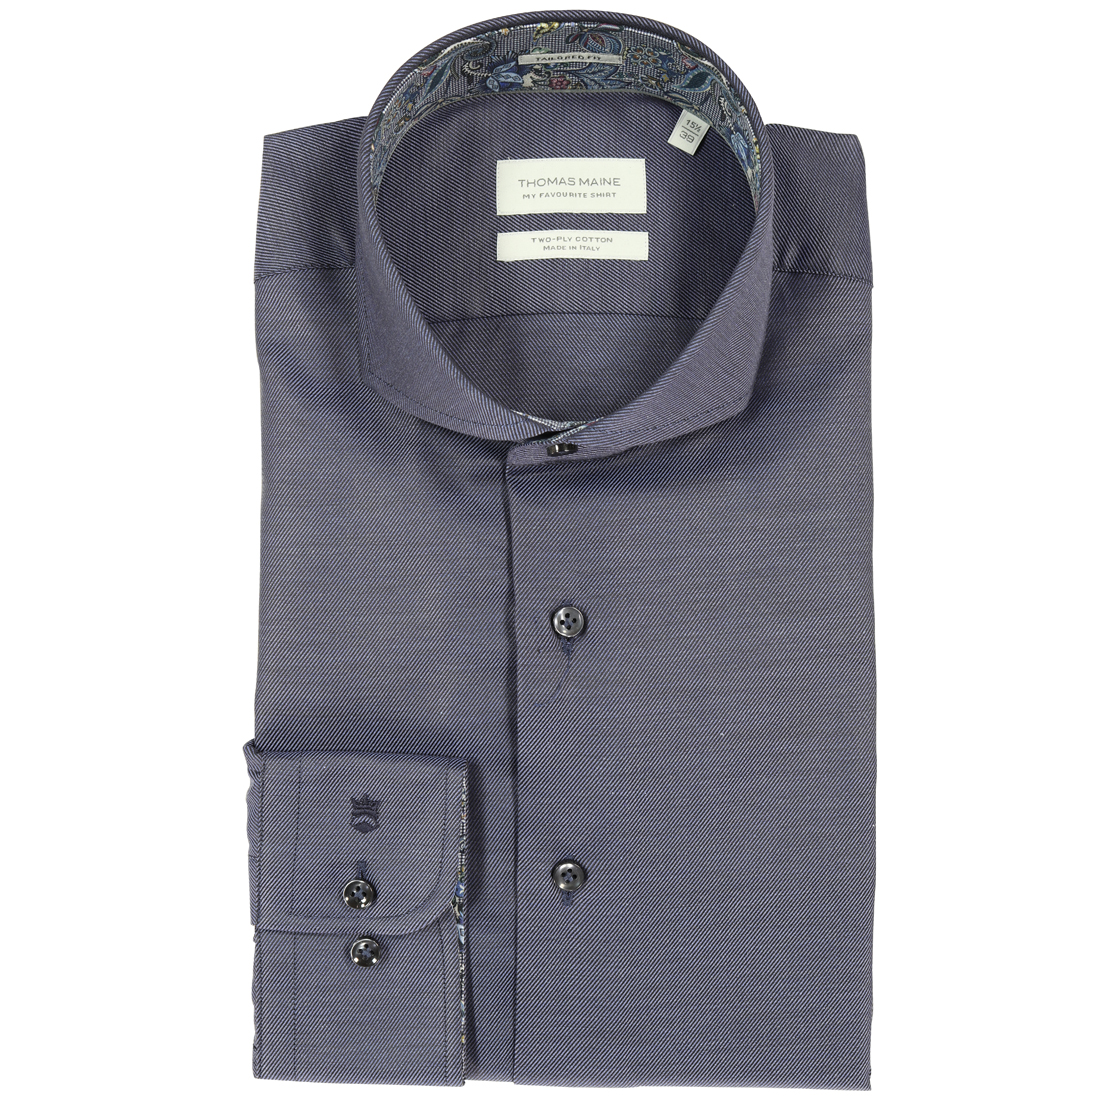 Image of Thomas Maine overhemd 827720 in het Blauw